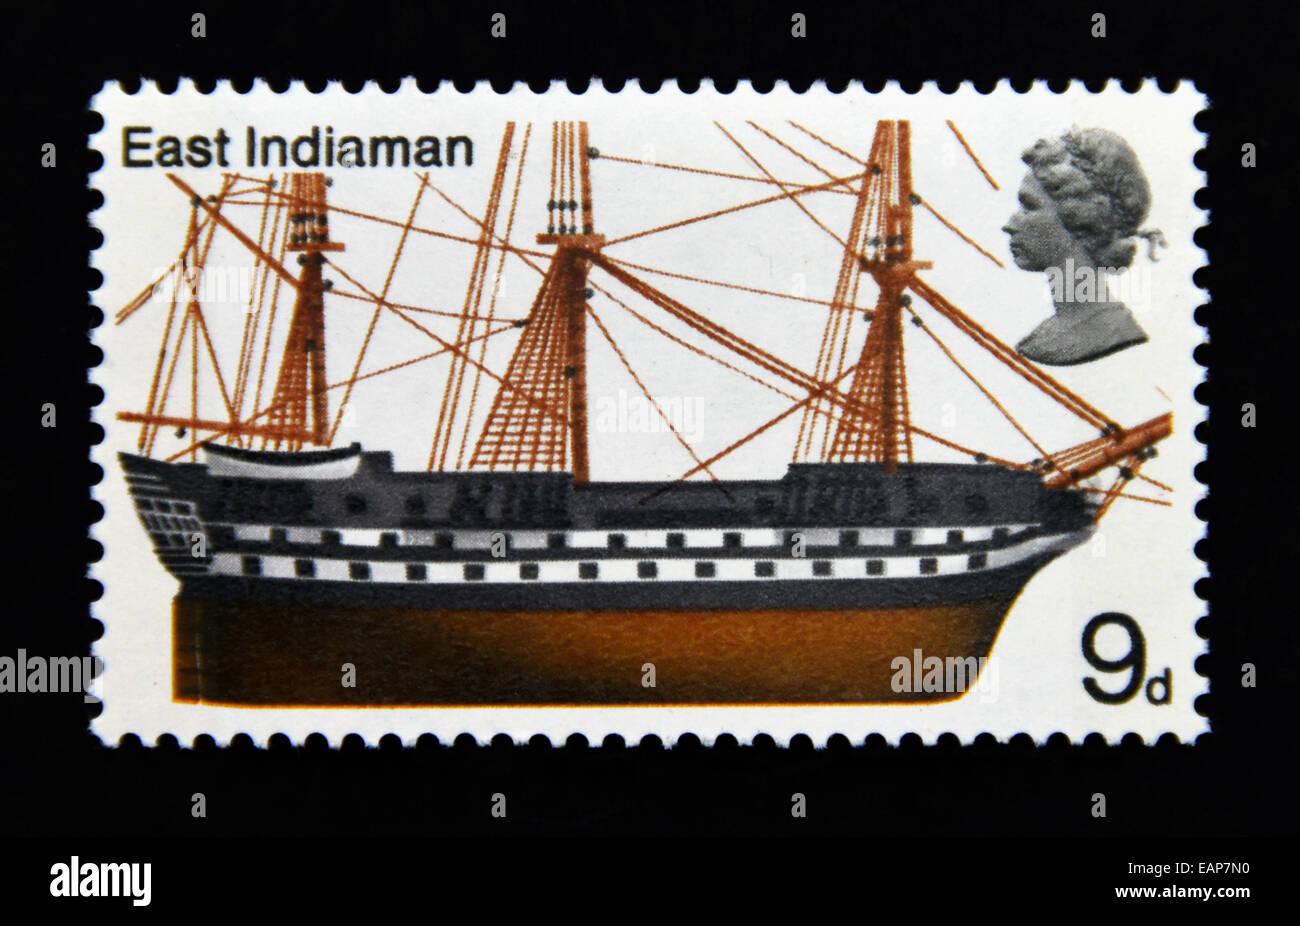 Postage stamp. Great Britain. Queen Elizabeth II. British Ships. 1969. East Indiaman. 9d. - Stock Image